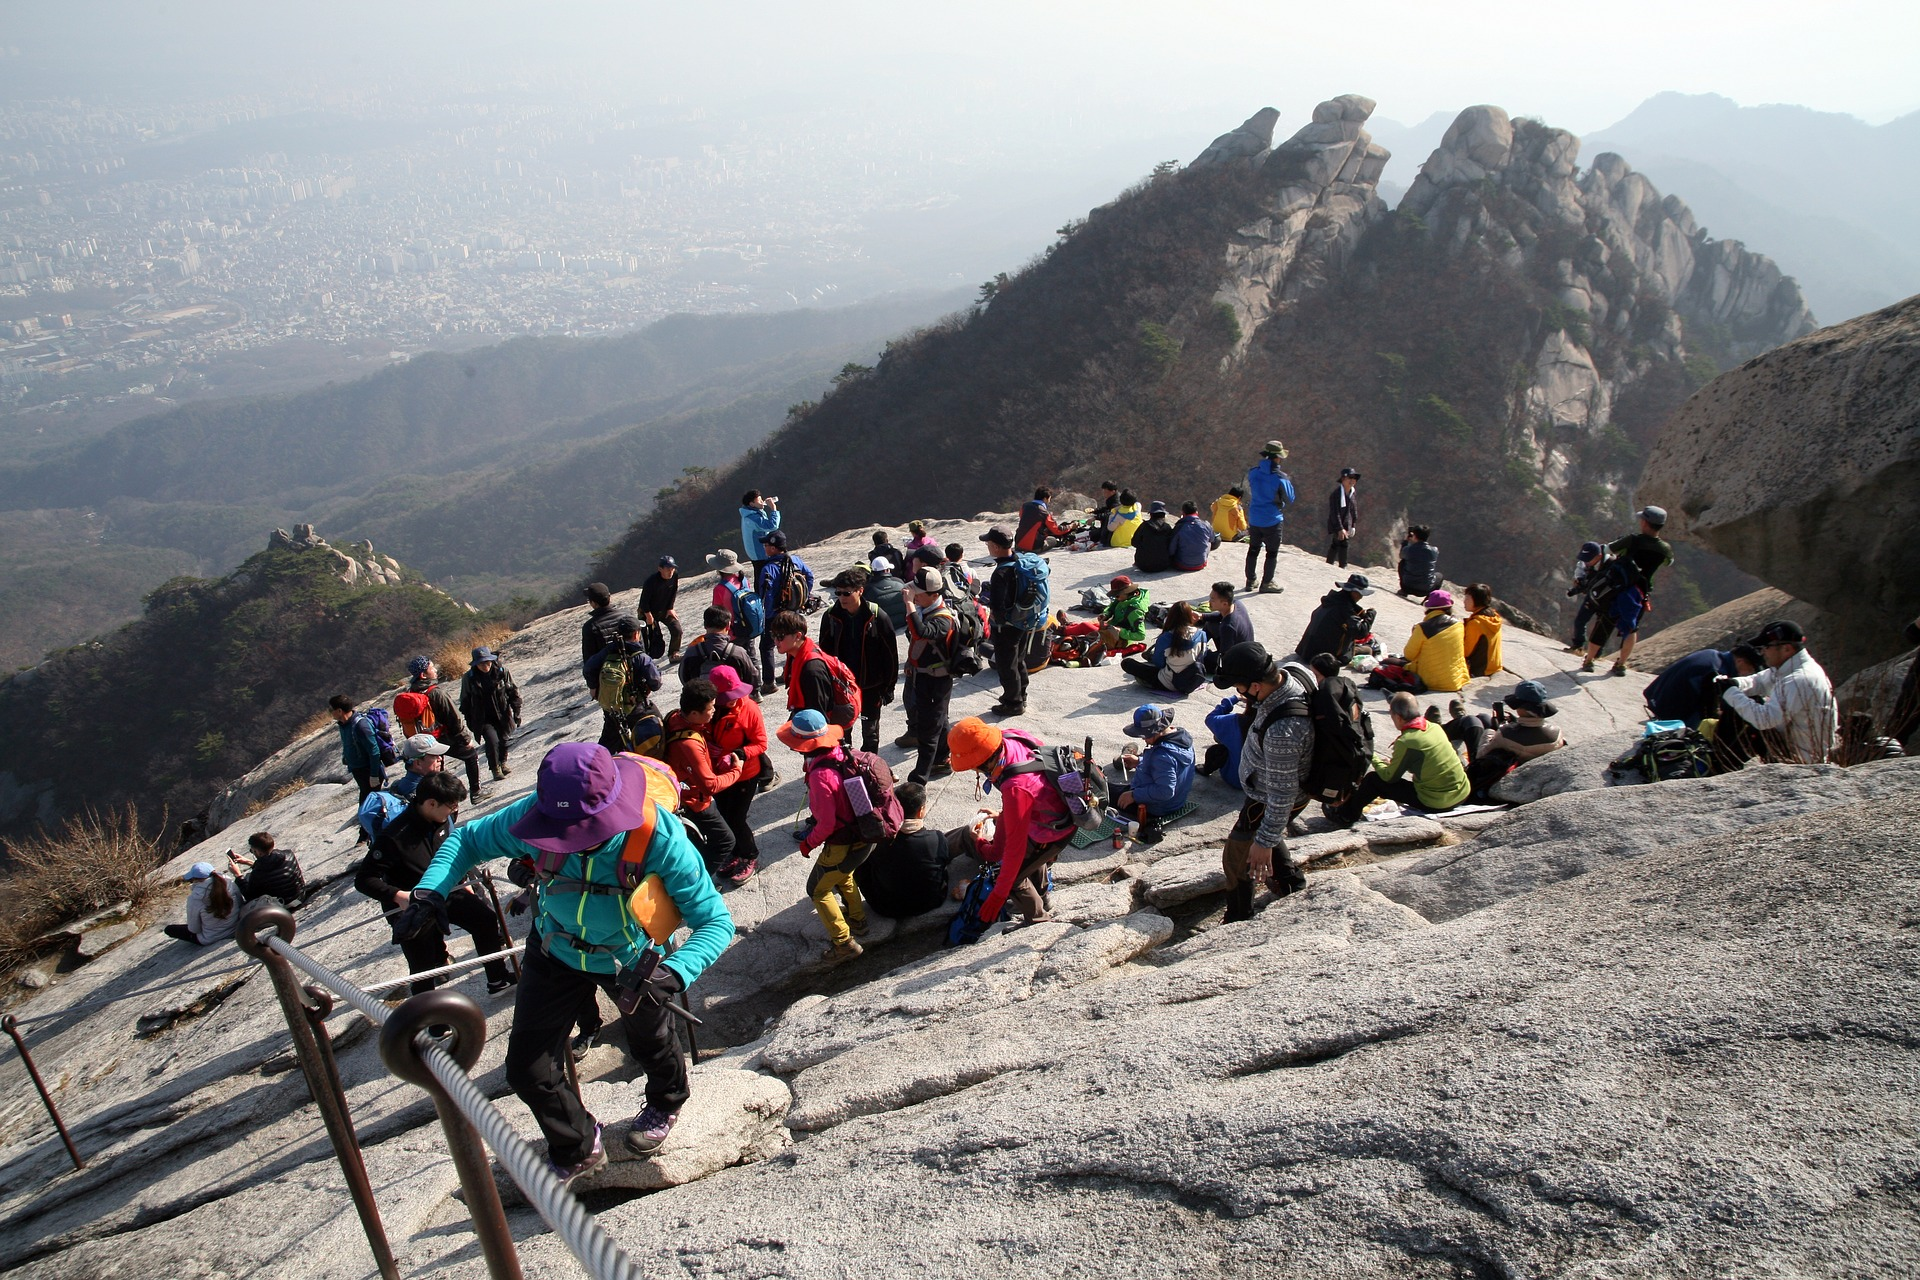 bukhansan-mountain.jpg